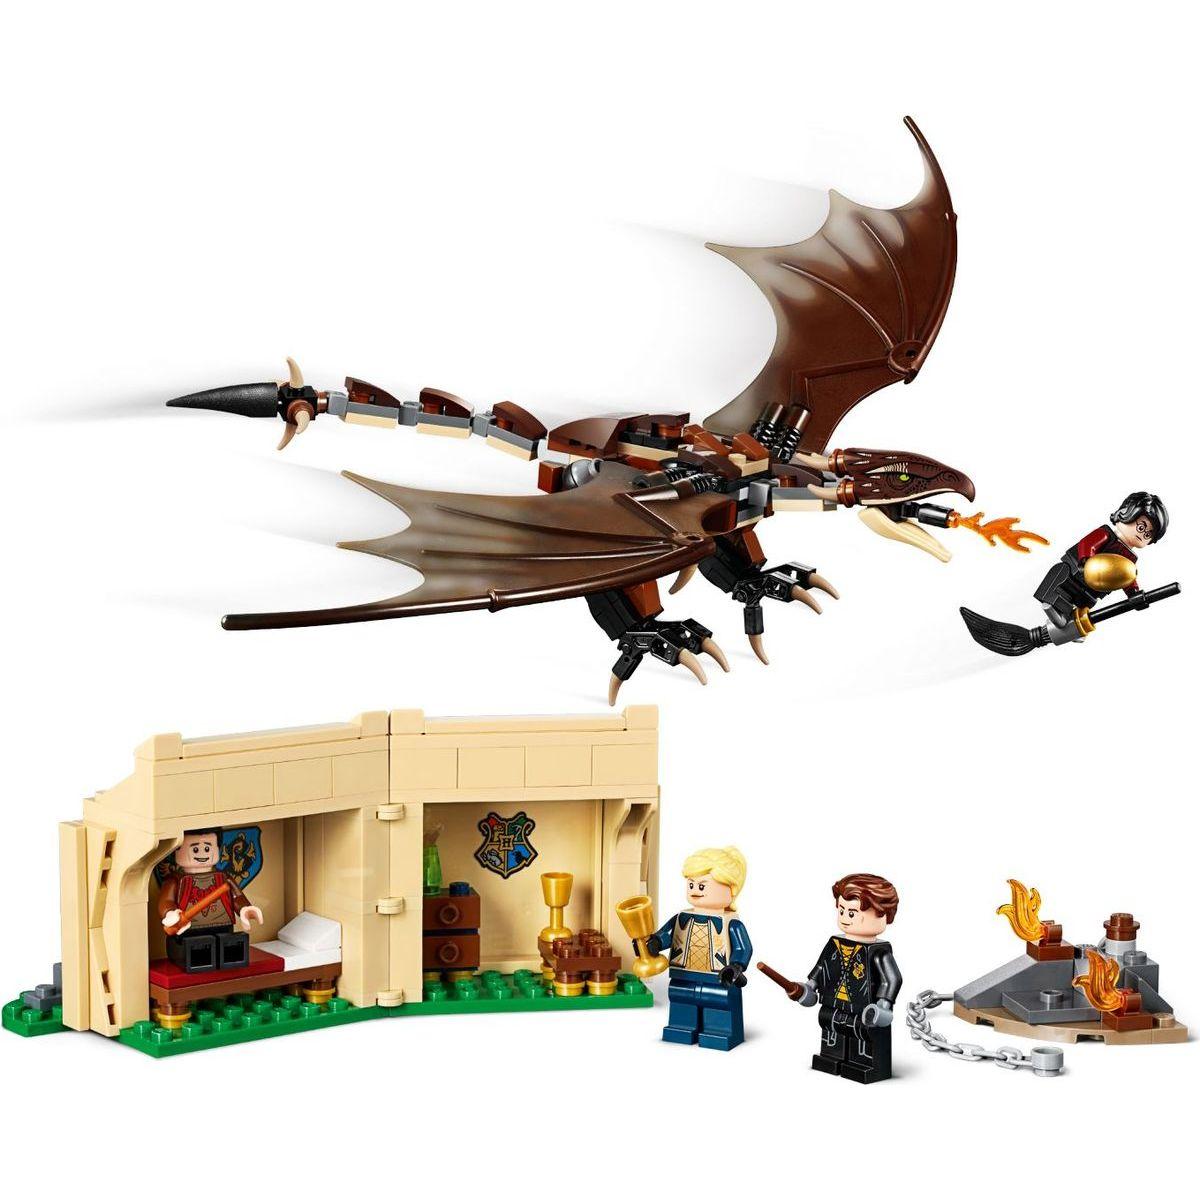 LEGO Harry Potter TM 75946 Maďarský trnoocasý drak: Turnaj tří kou